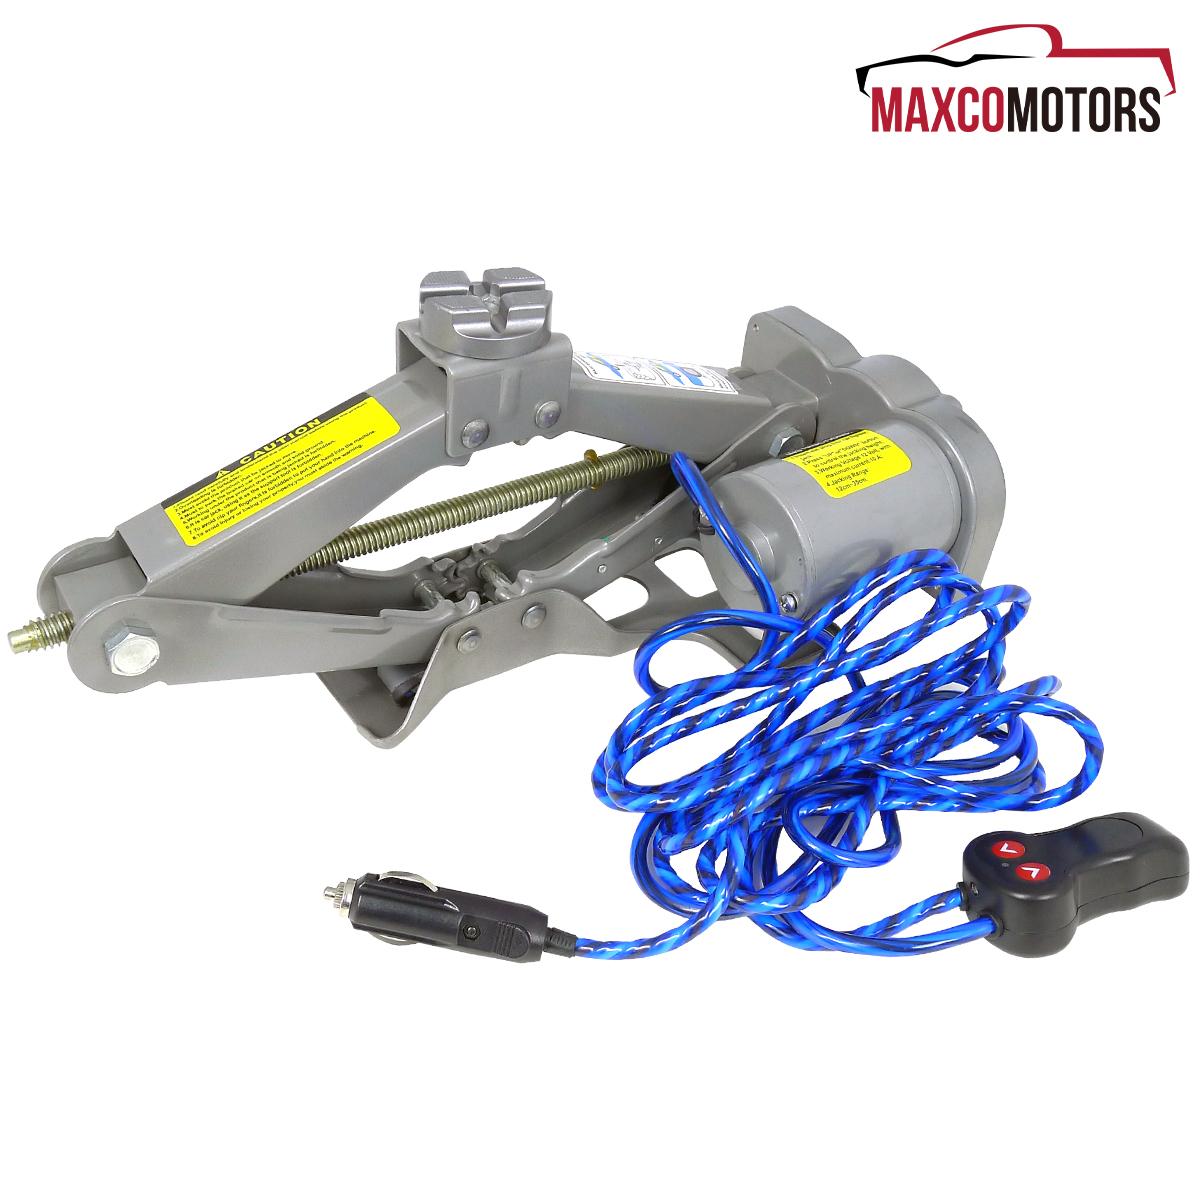 Electric Lift Kits : Electric car truck scissor jack lift wrench kit dc